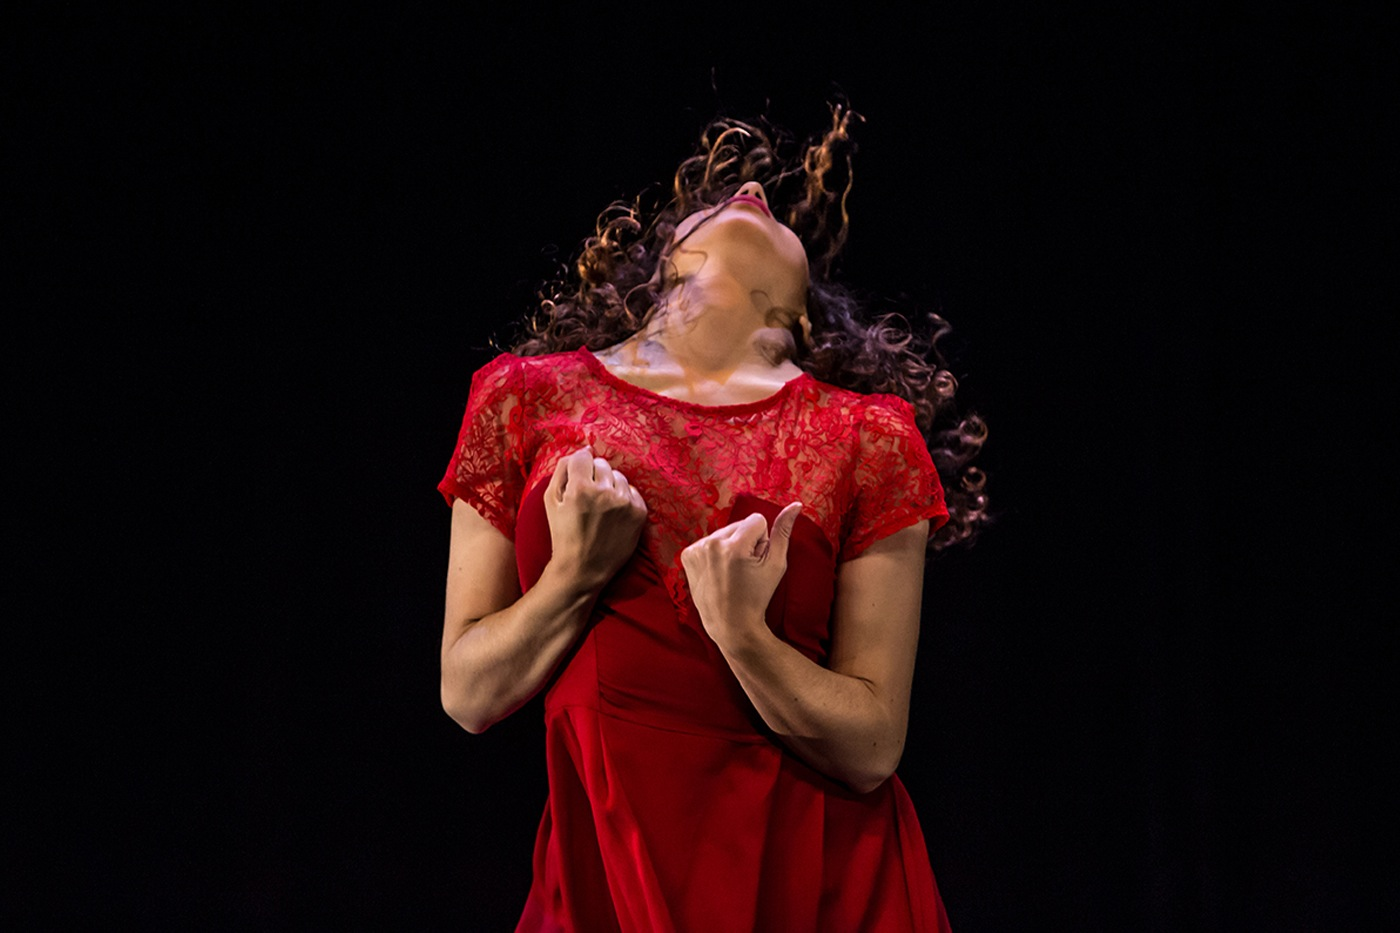 photographe-reportage-danse-avec-ton-crous-guillaume-heraud-002-small